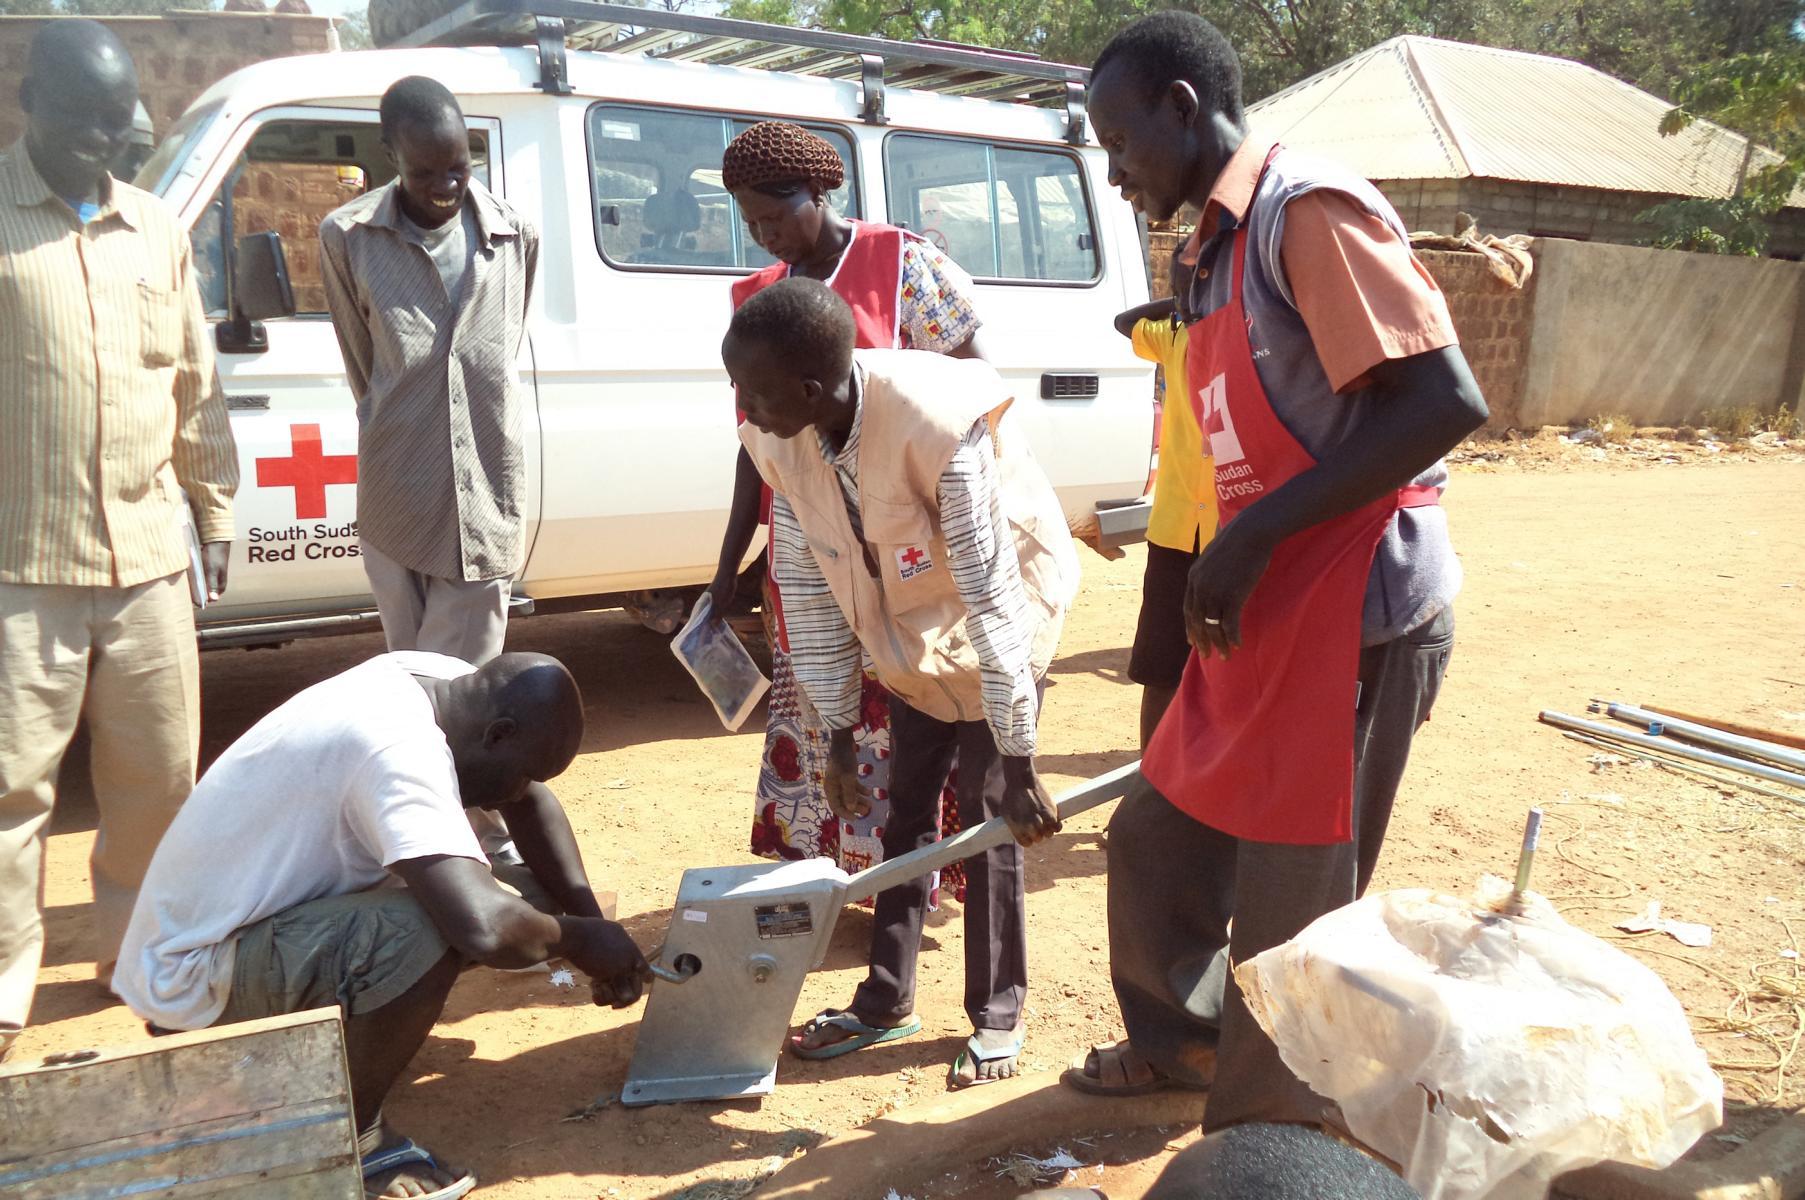 SSRC volunteers repairing a handpump